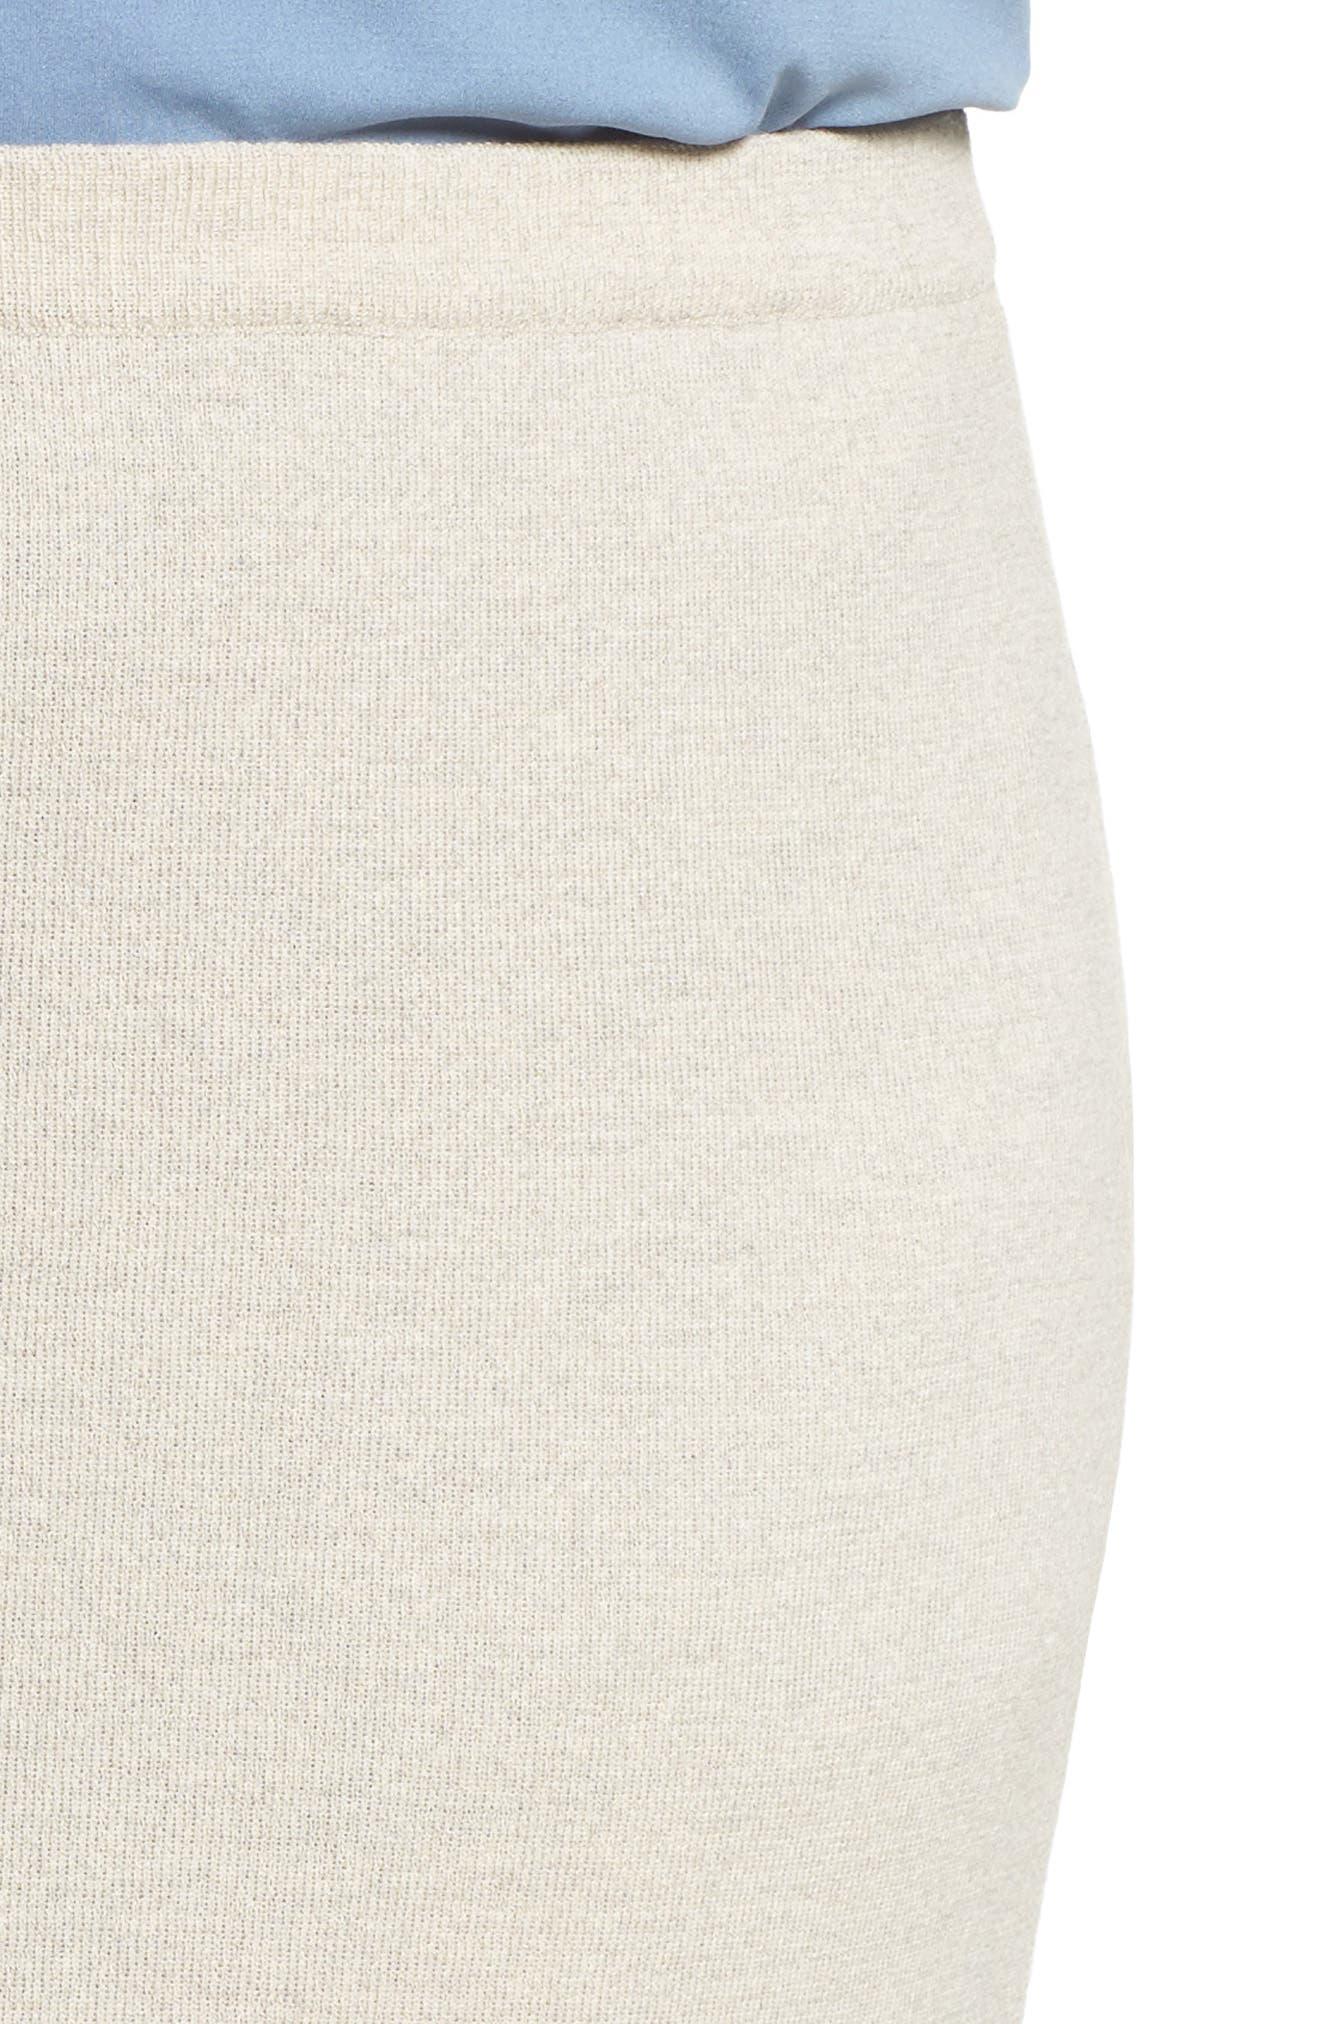 Wool Knit Pencil Skirt,                             Alternate thumbnail 4, color,                             Sea Salt